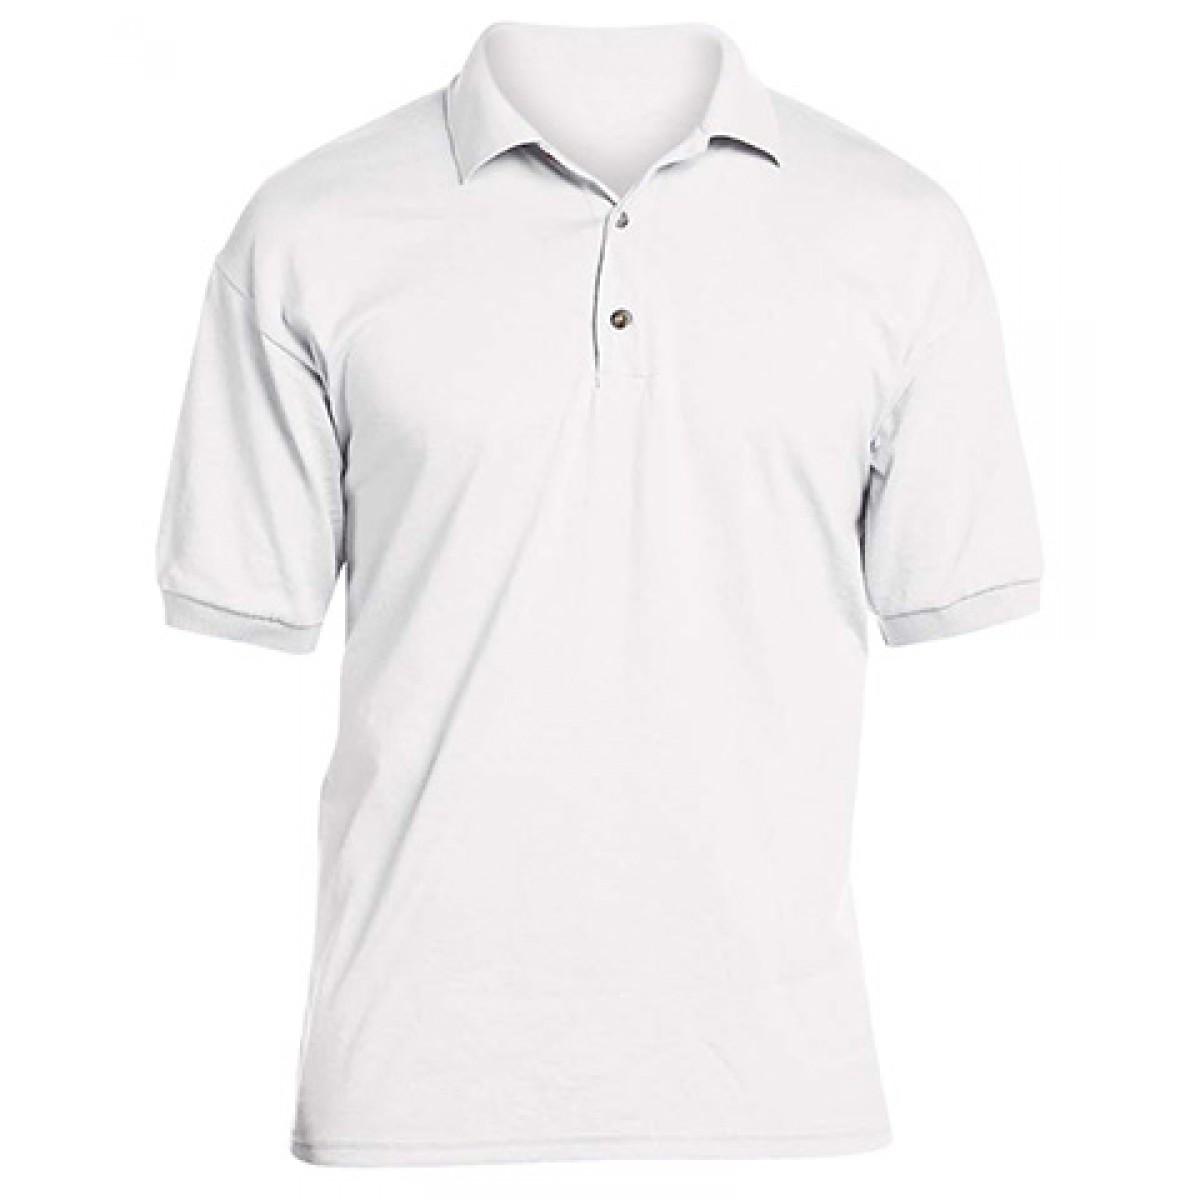 Jersey Polo 50/50 -White-S